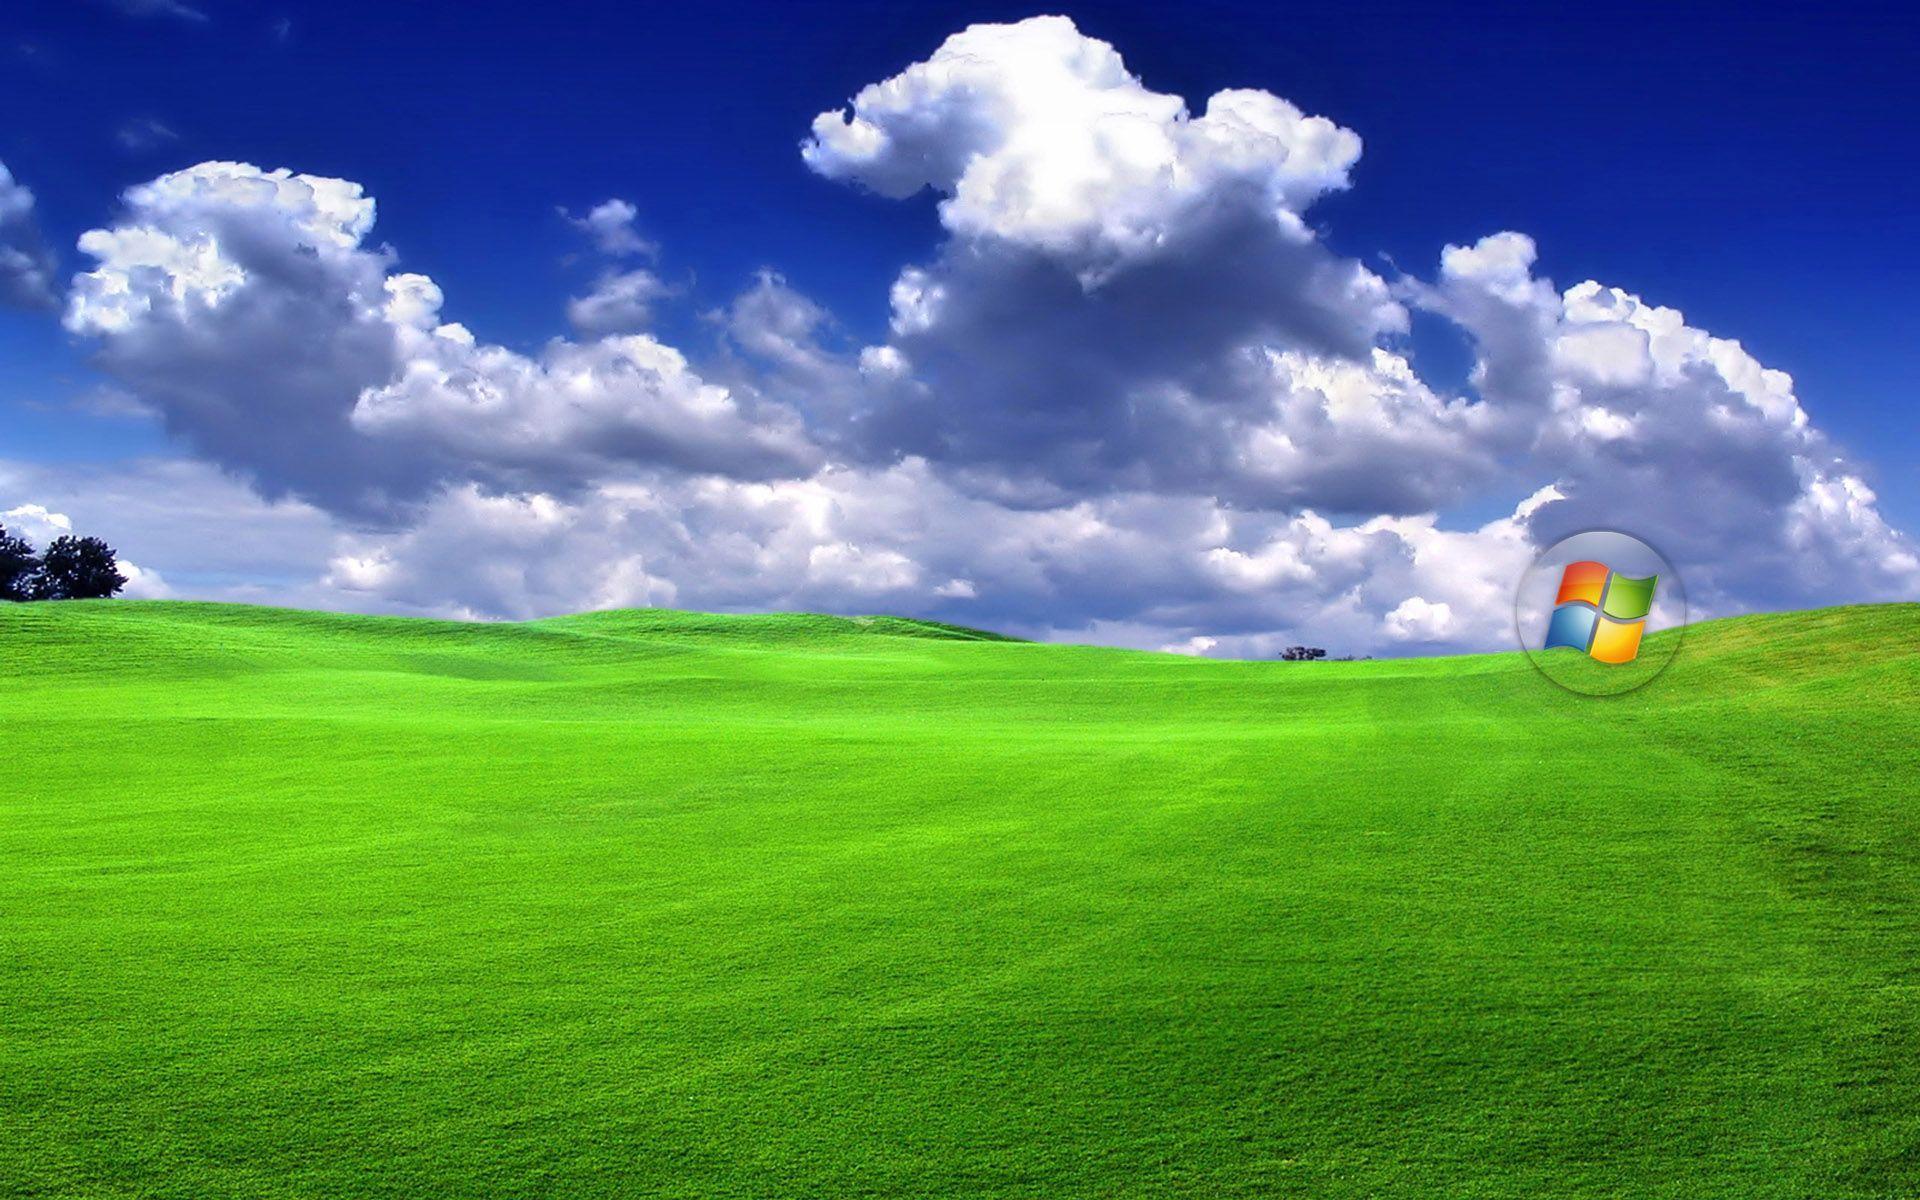 Nature Windows Desktop Backgrounds Hd